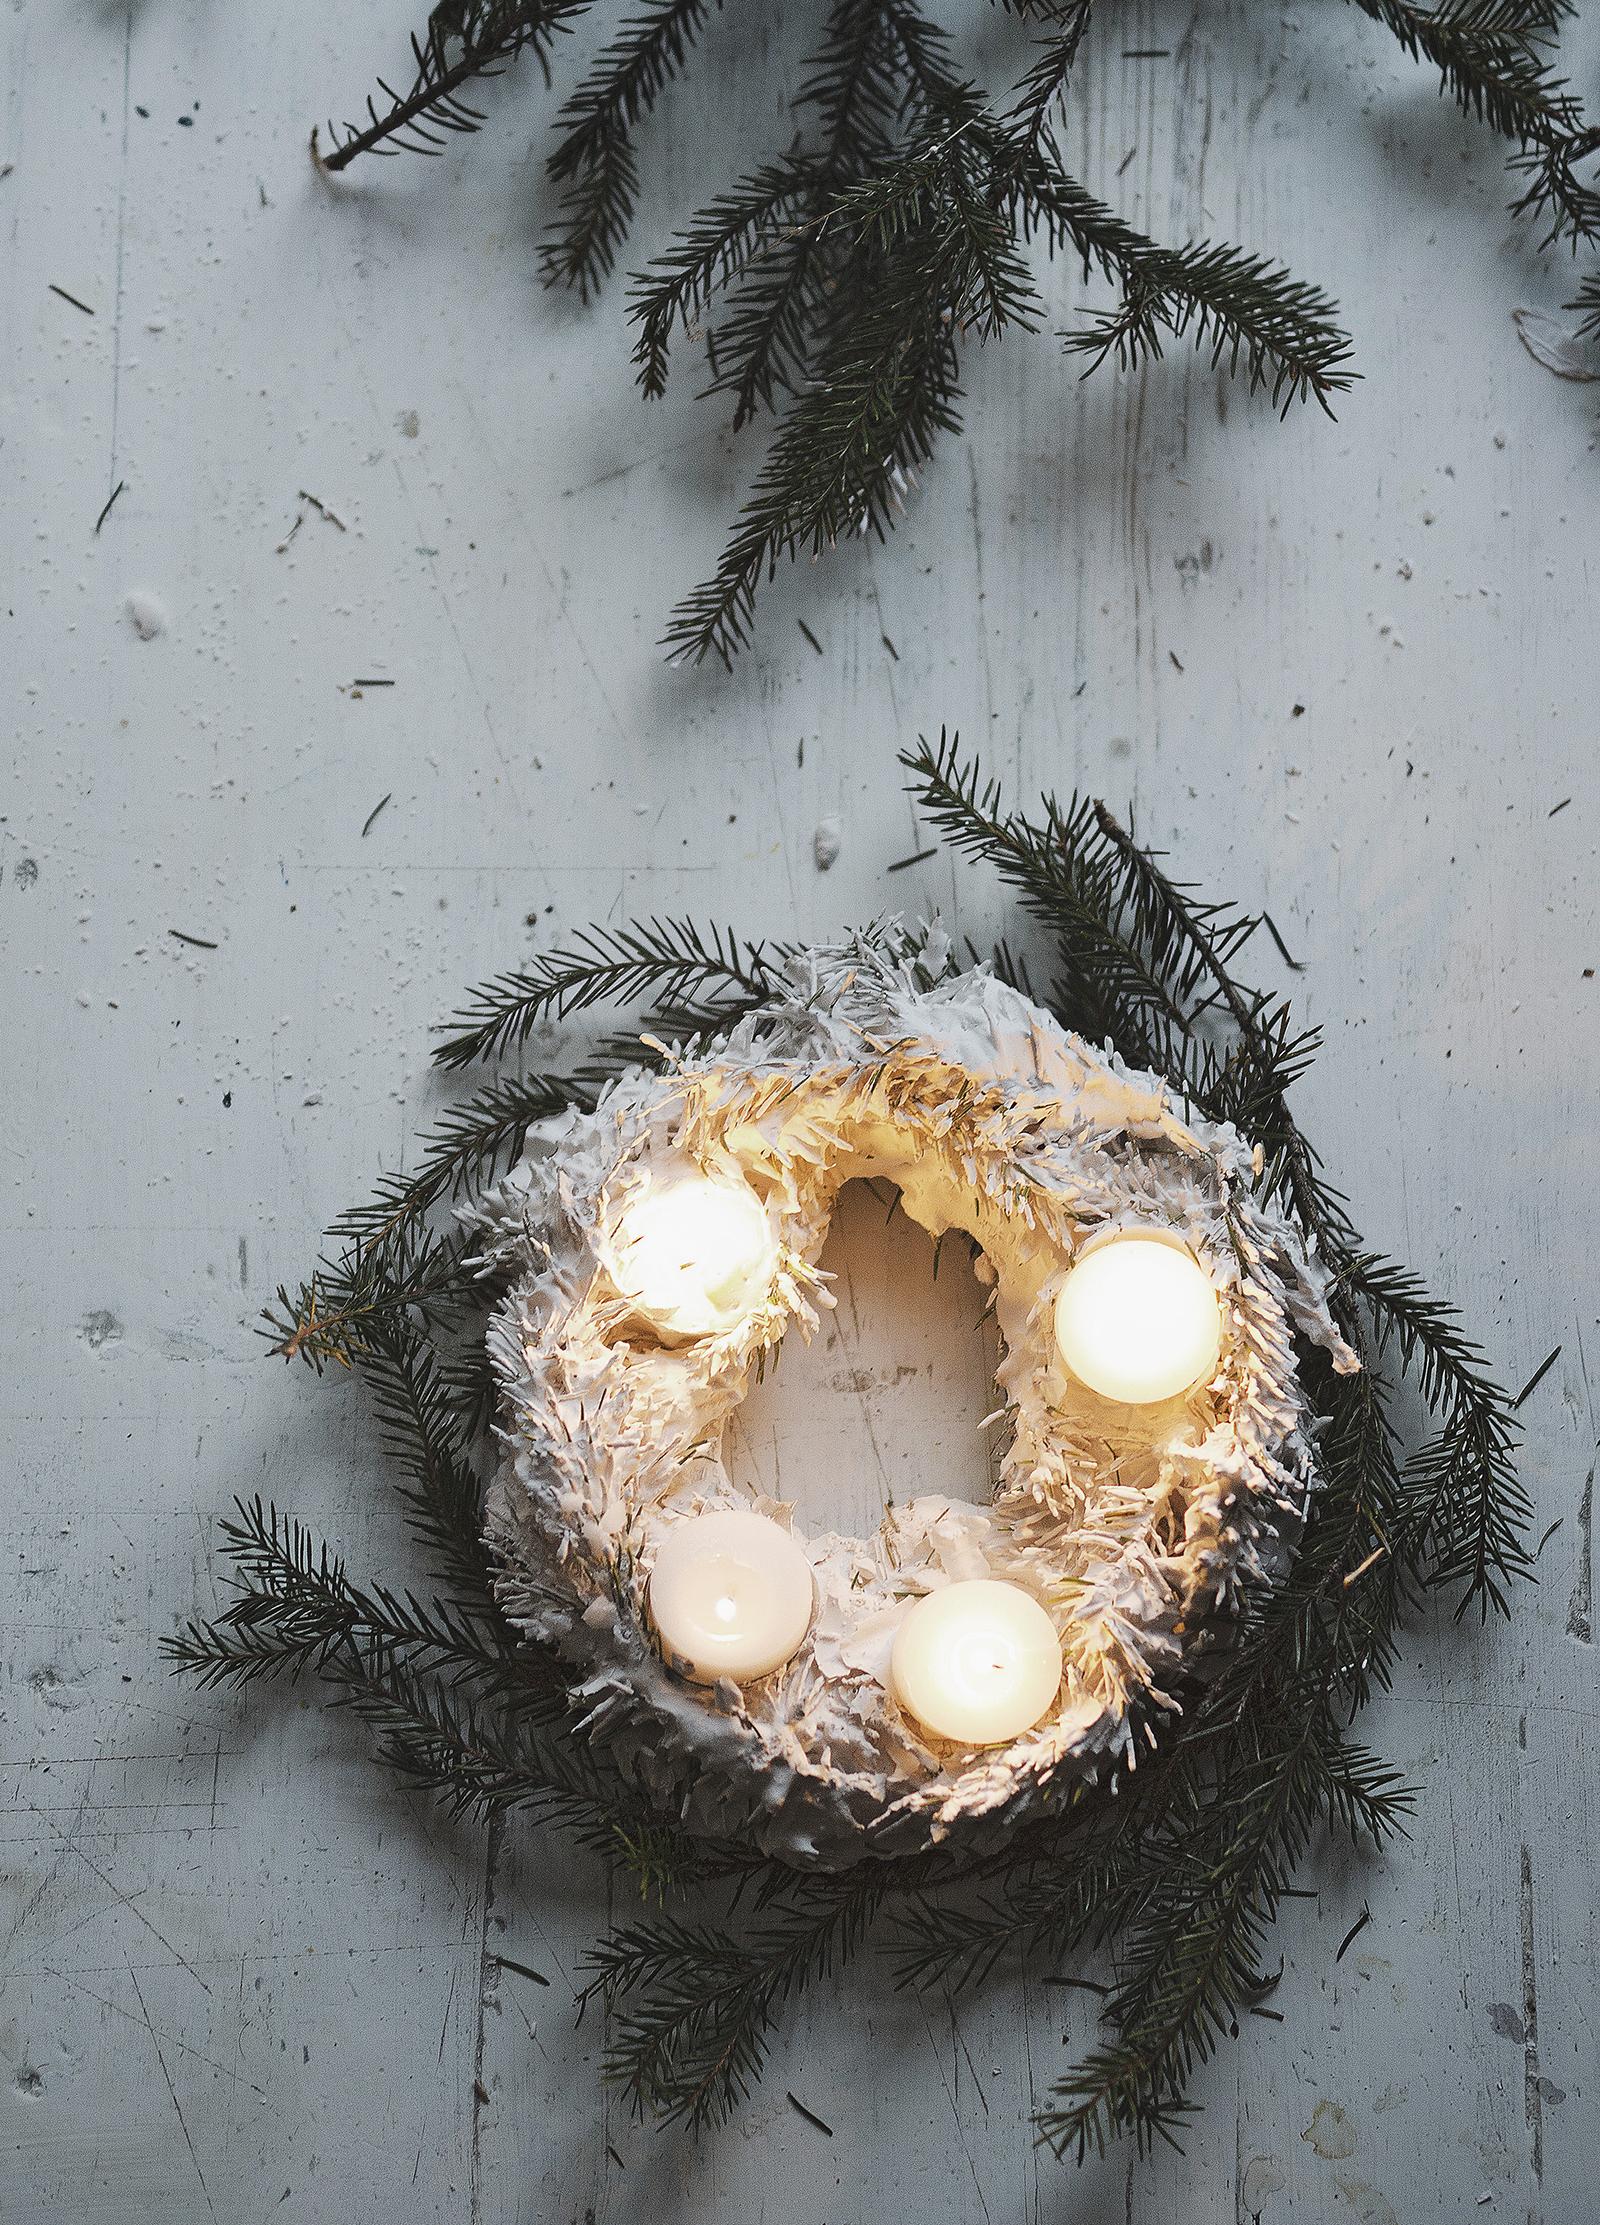 1600_notxt-Dec1 Plaster WreathDK